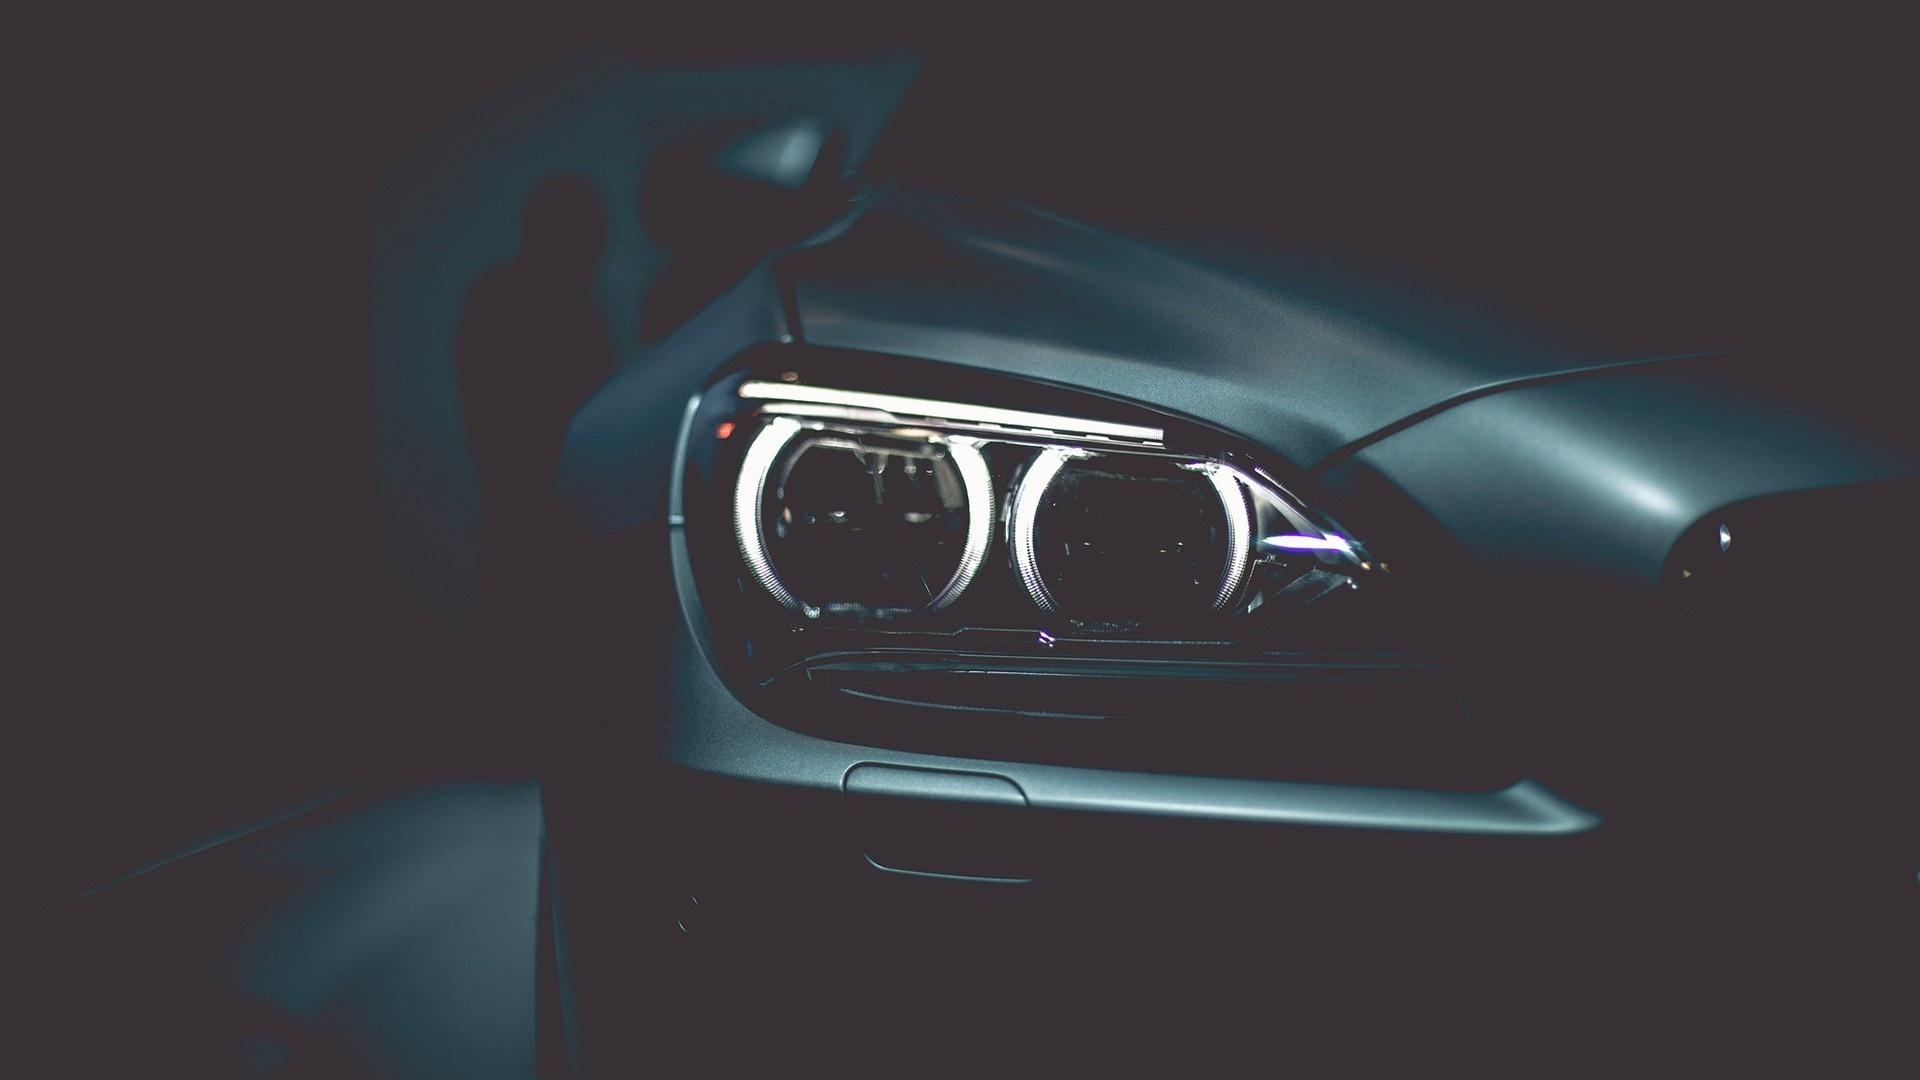 Wallpaper Black Illustration Car Glasses Bmw Vehicle